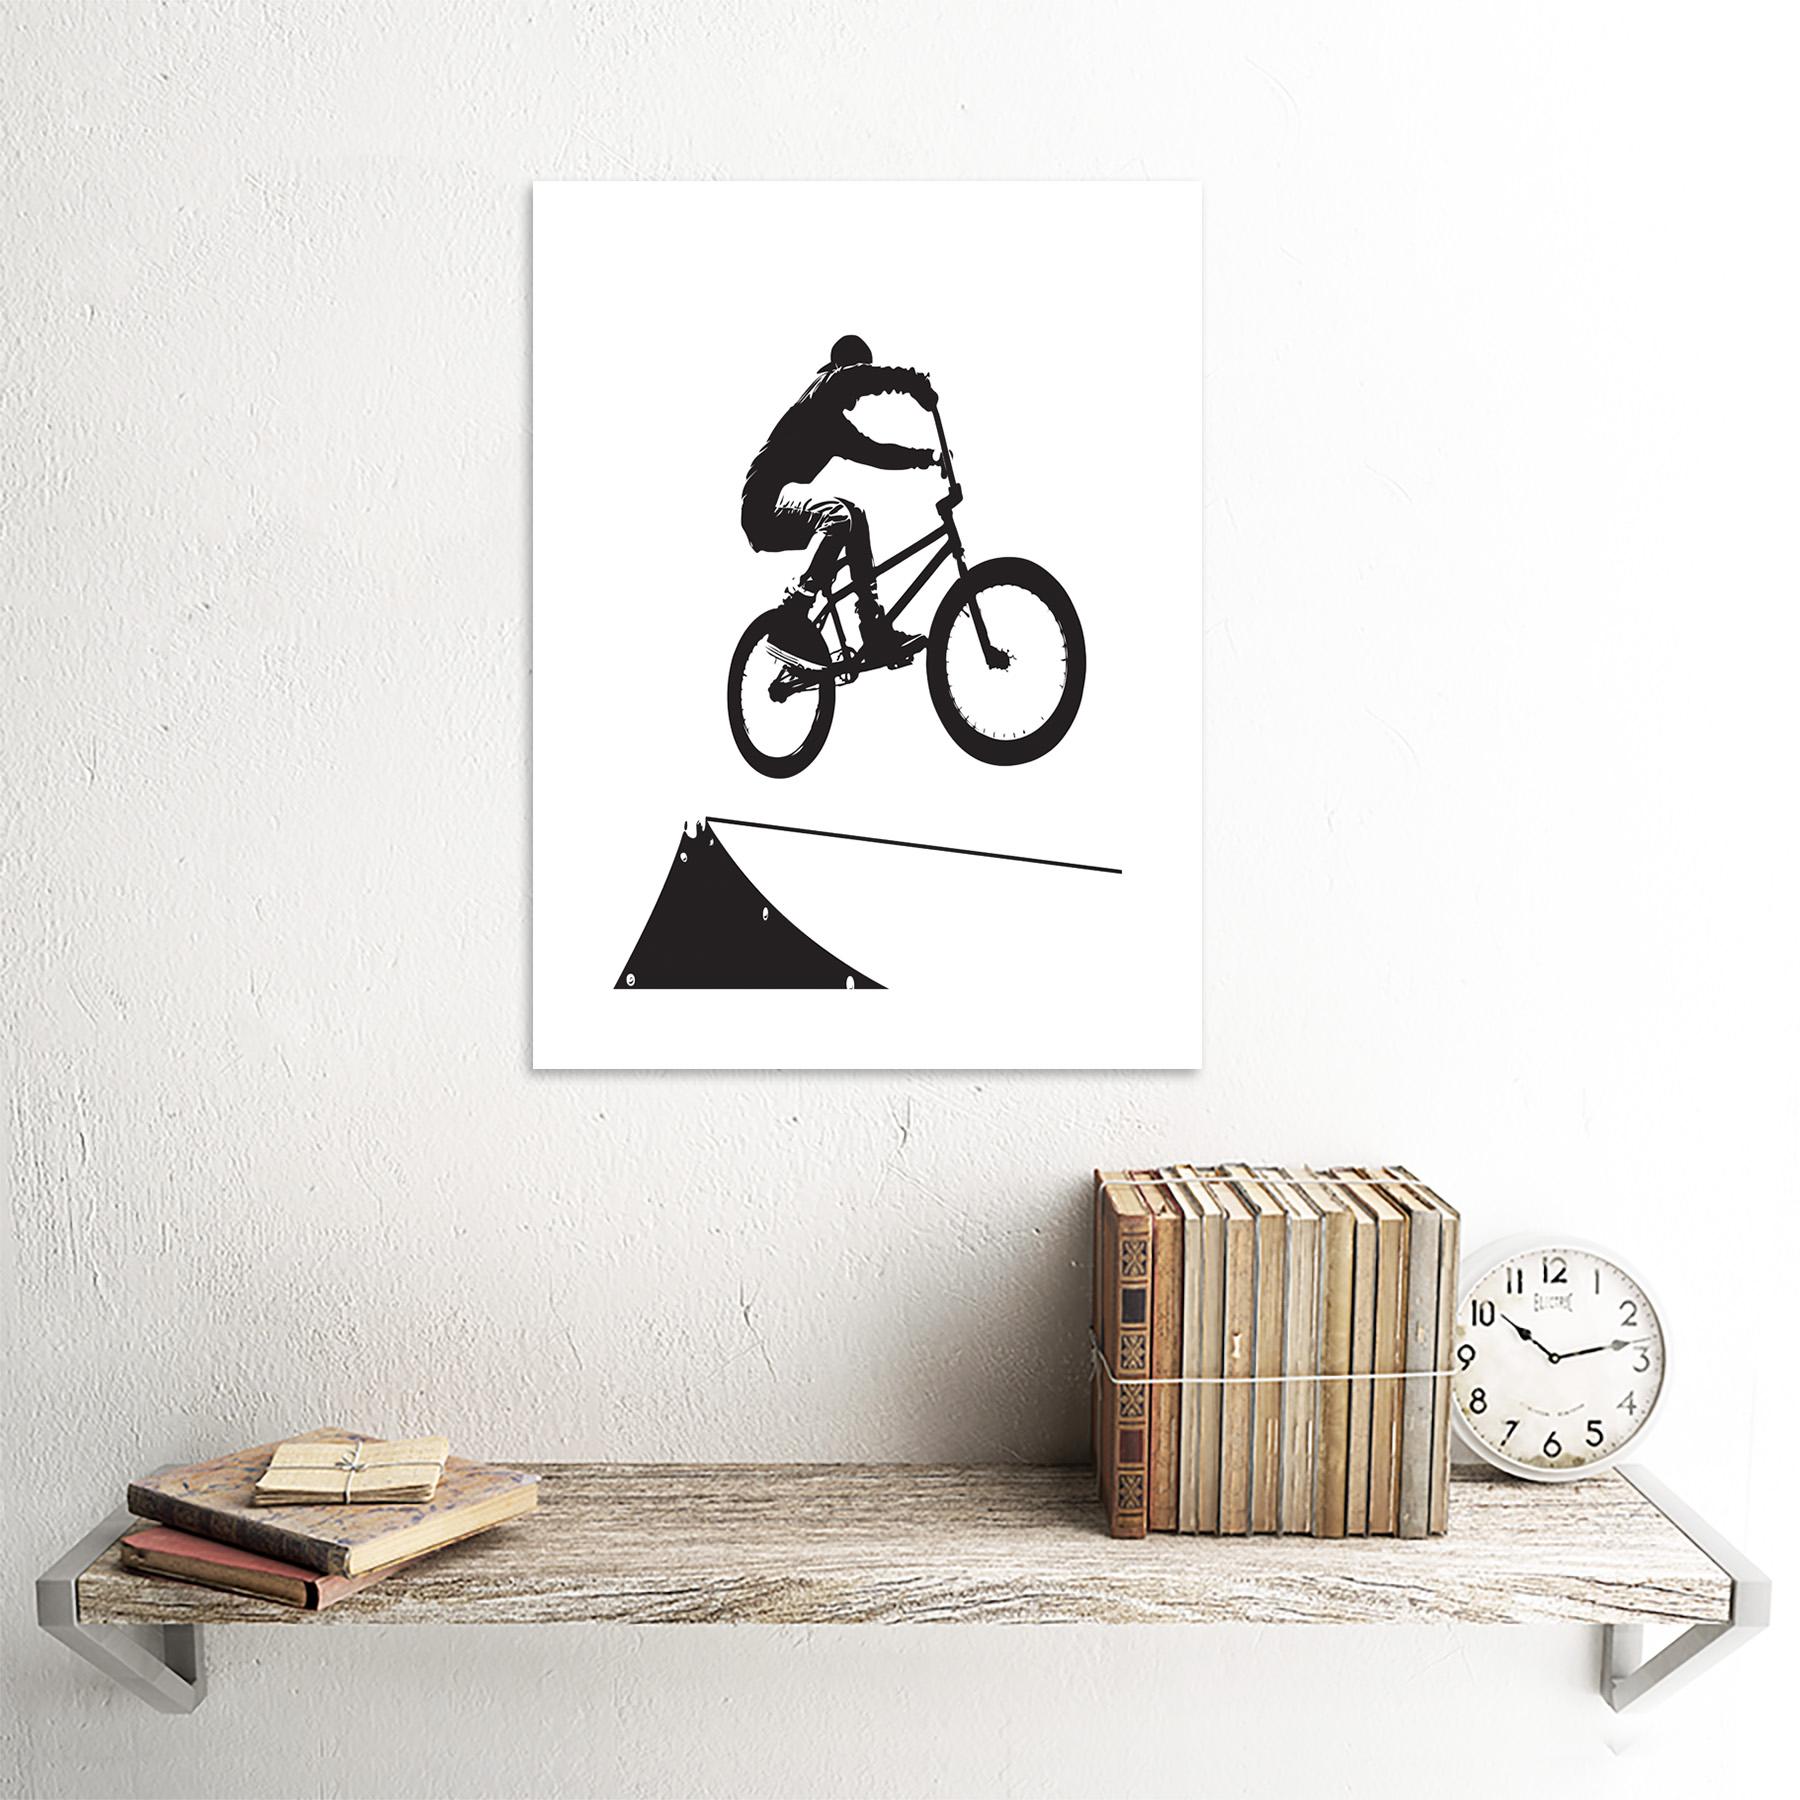 "Indexbild 18 - Painting Sport Bmx Bike Bicycle Jump Air Ramp Black White Framed Print 12x16"""